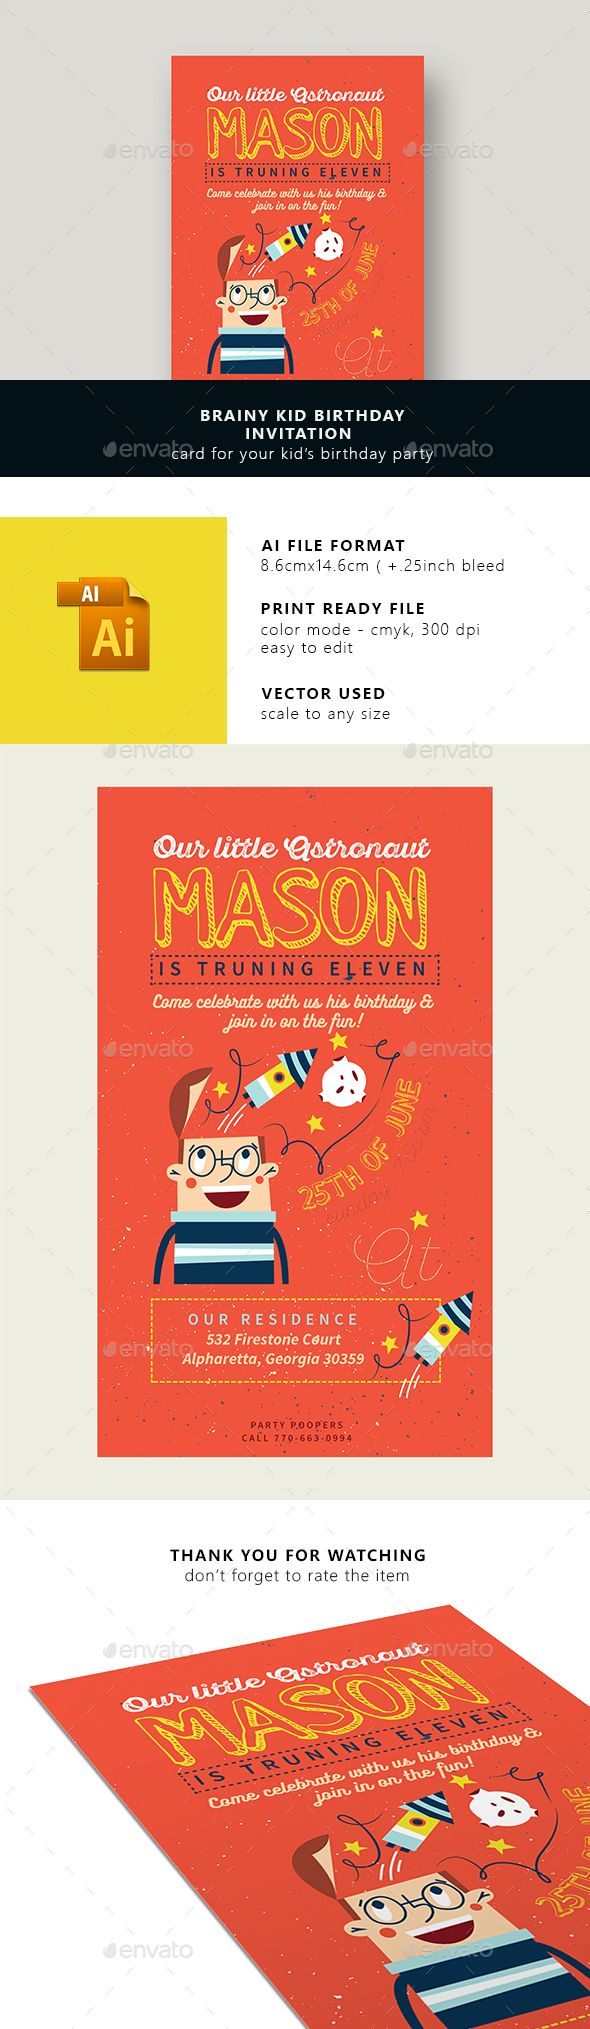 Brainy Kid Birhday Invitation Card | Pinterest | Ai illustrator ...